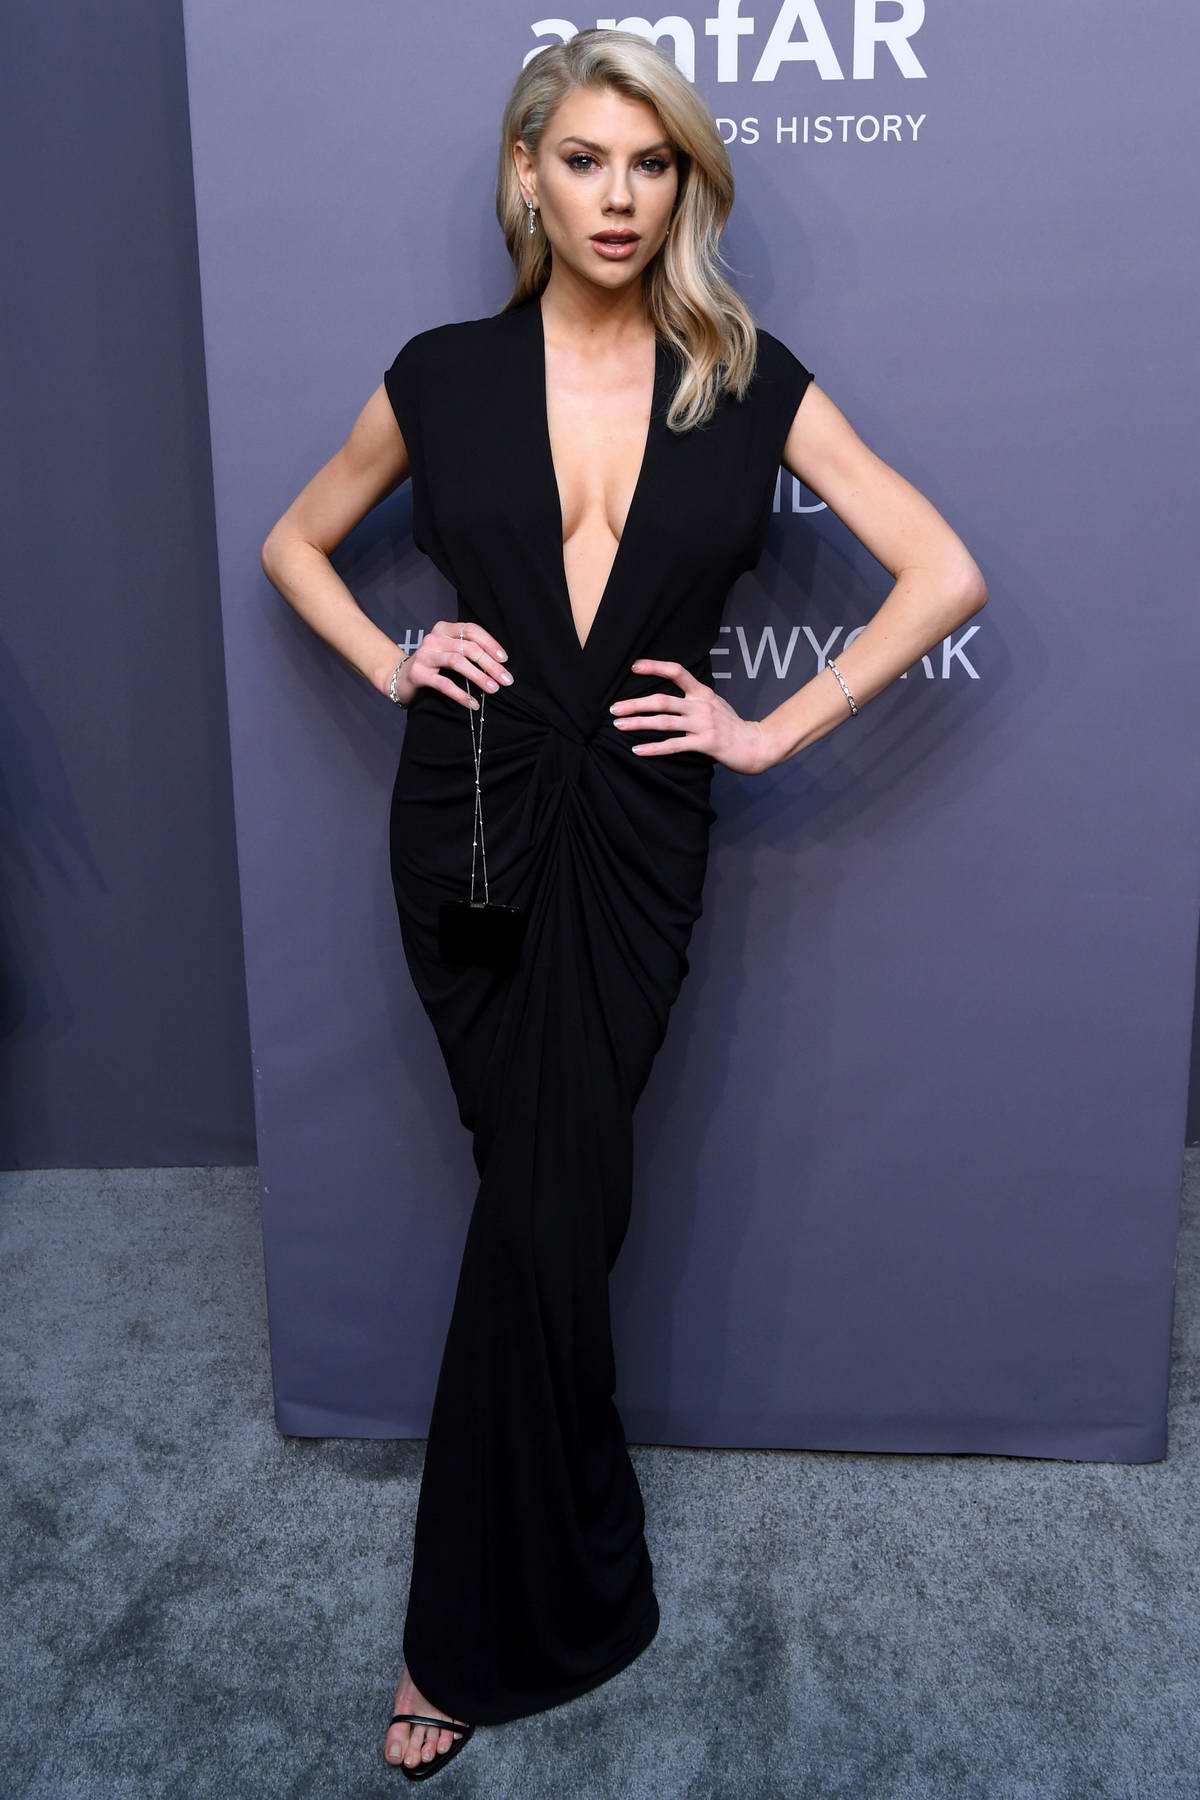 Charlotte McKinney attends amfAR New York Gala 2019 at Cipriani Wall Street in New York City